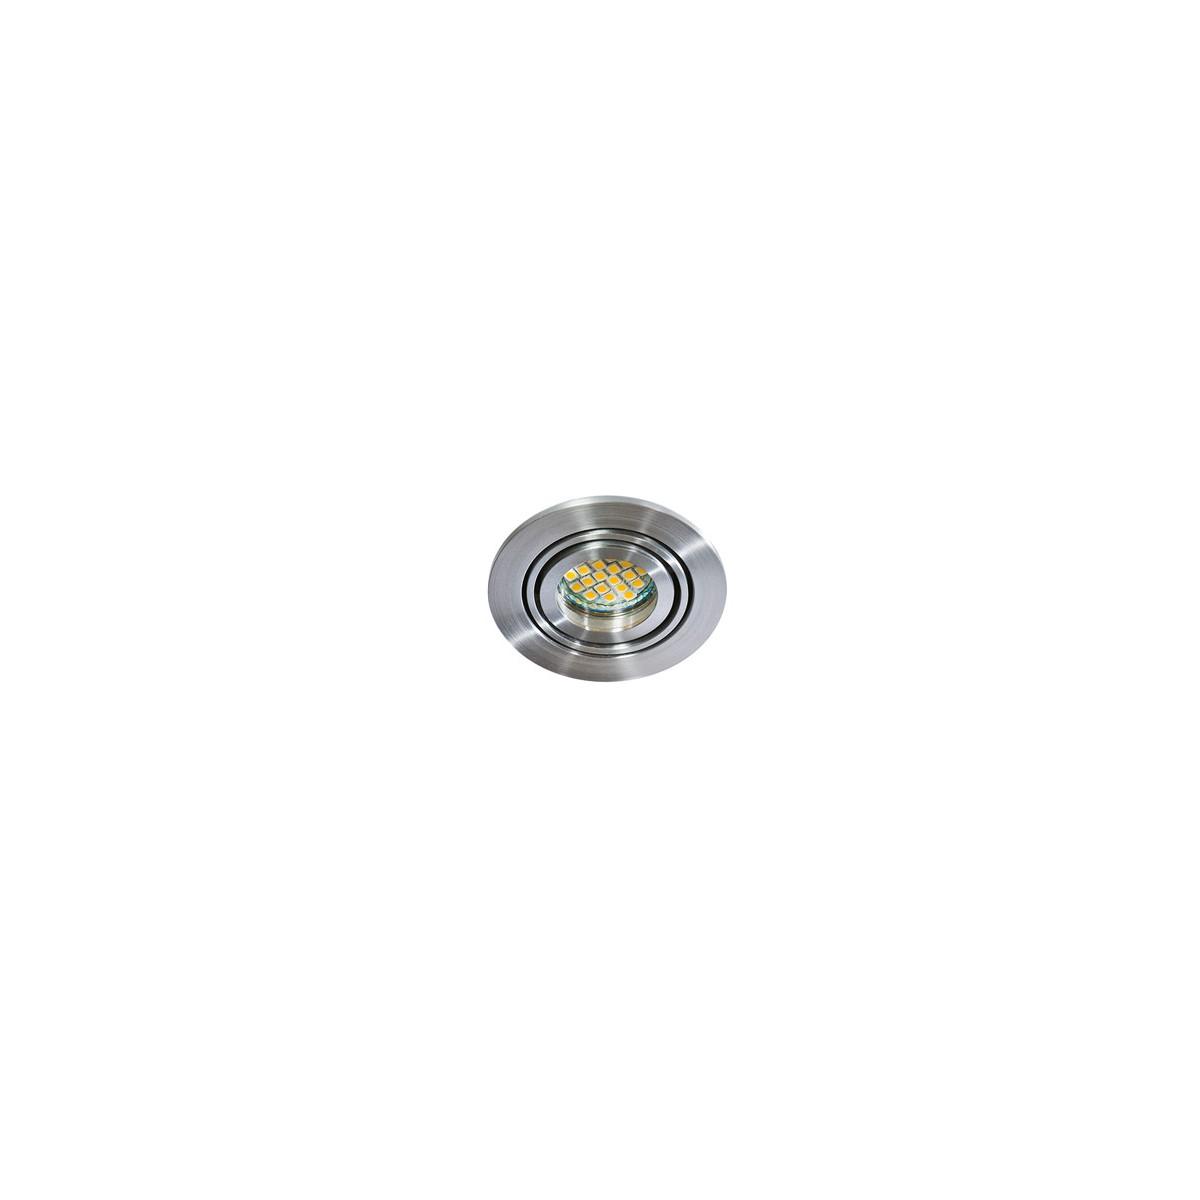 Azzardo CARLO 1 ALUMINIUM 1xGU10 Wpuszczana Aluminium AZ0804